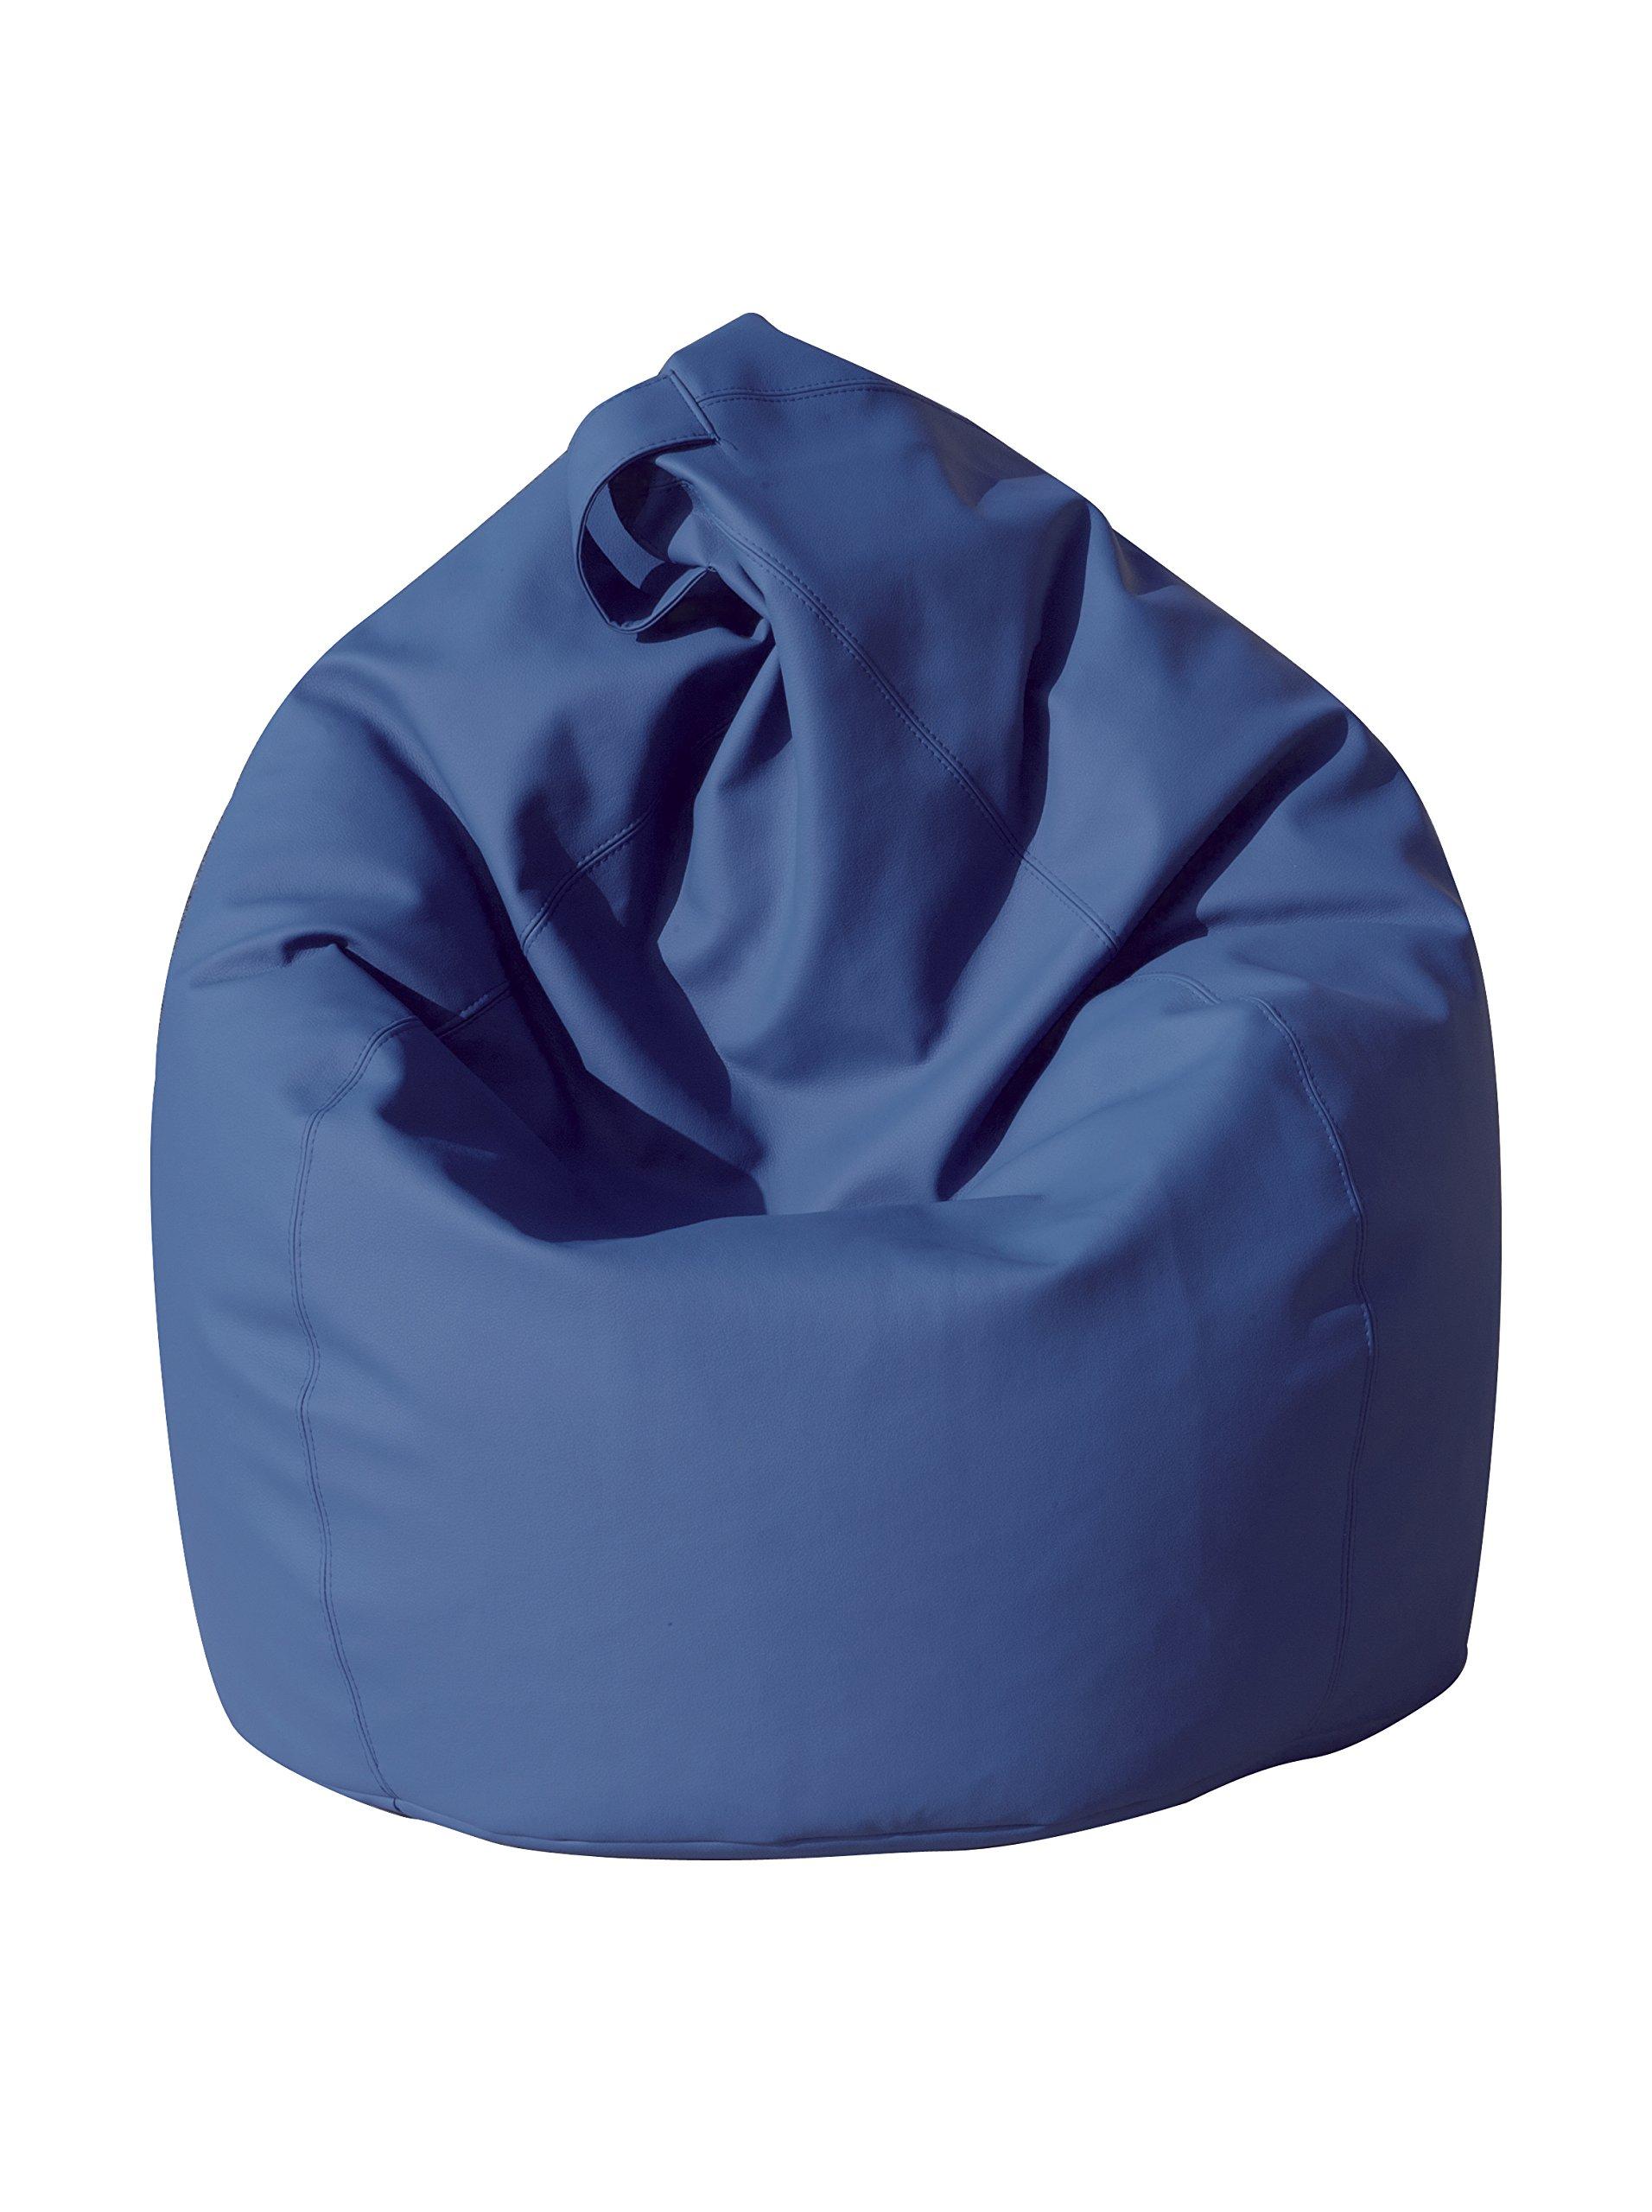 13Casa - Dea A3 - Poltrona sacco. Dim: 70x70x110 h cm. Col: Blu. Mat: Ecopelle. product image